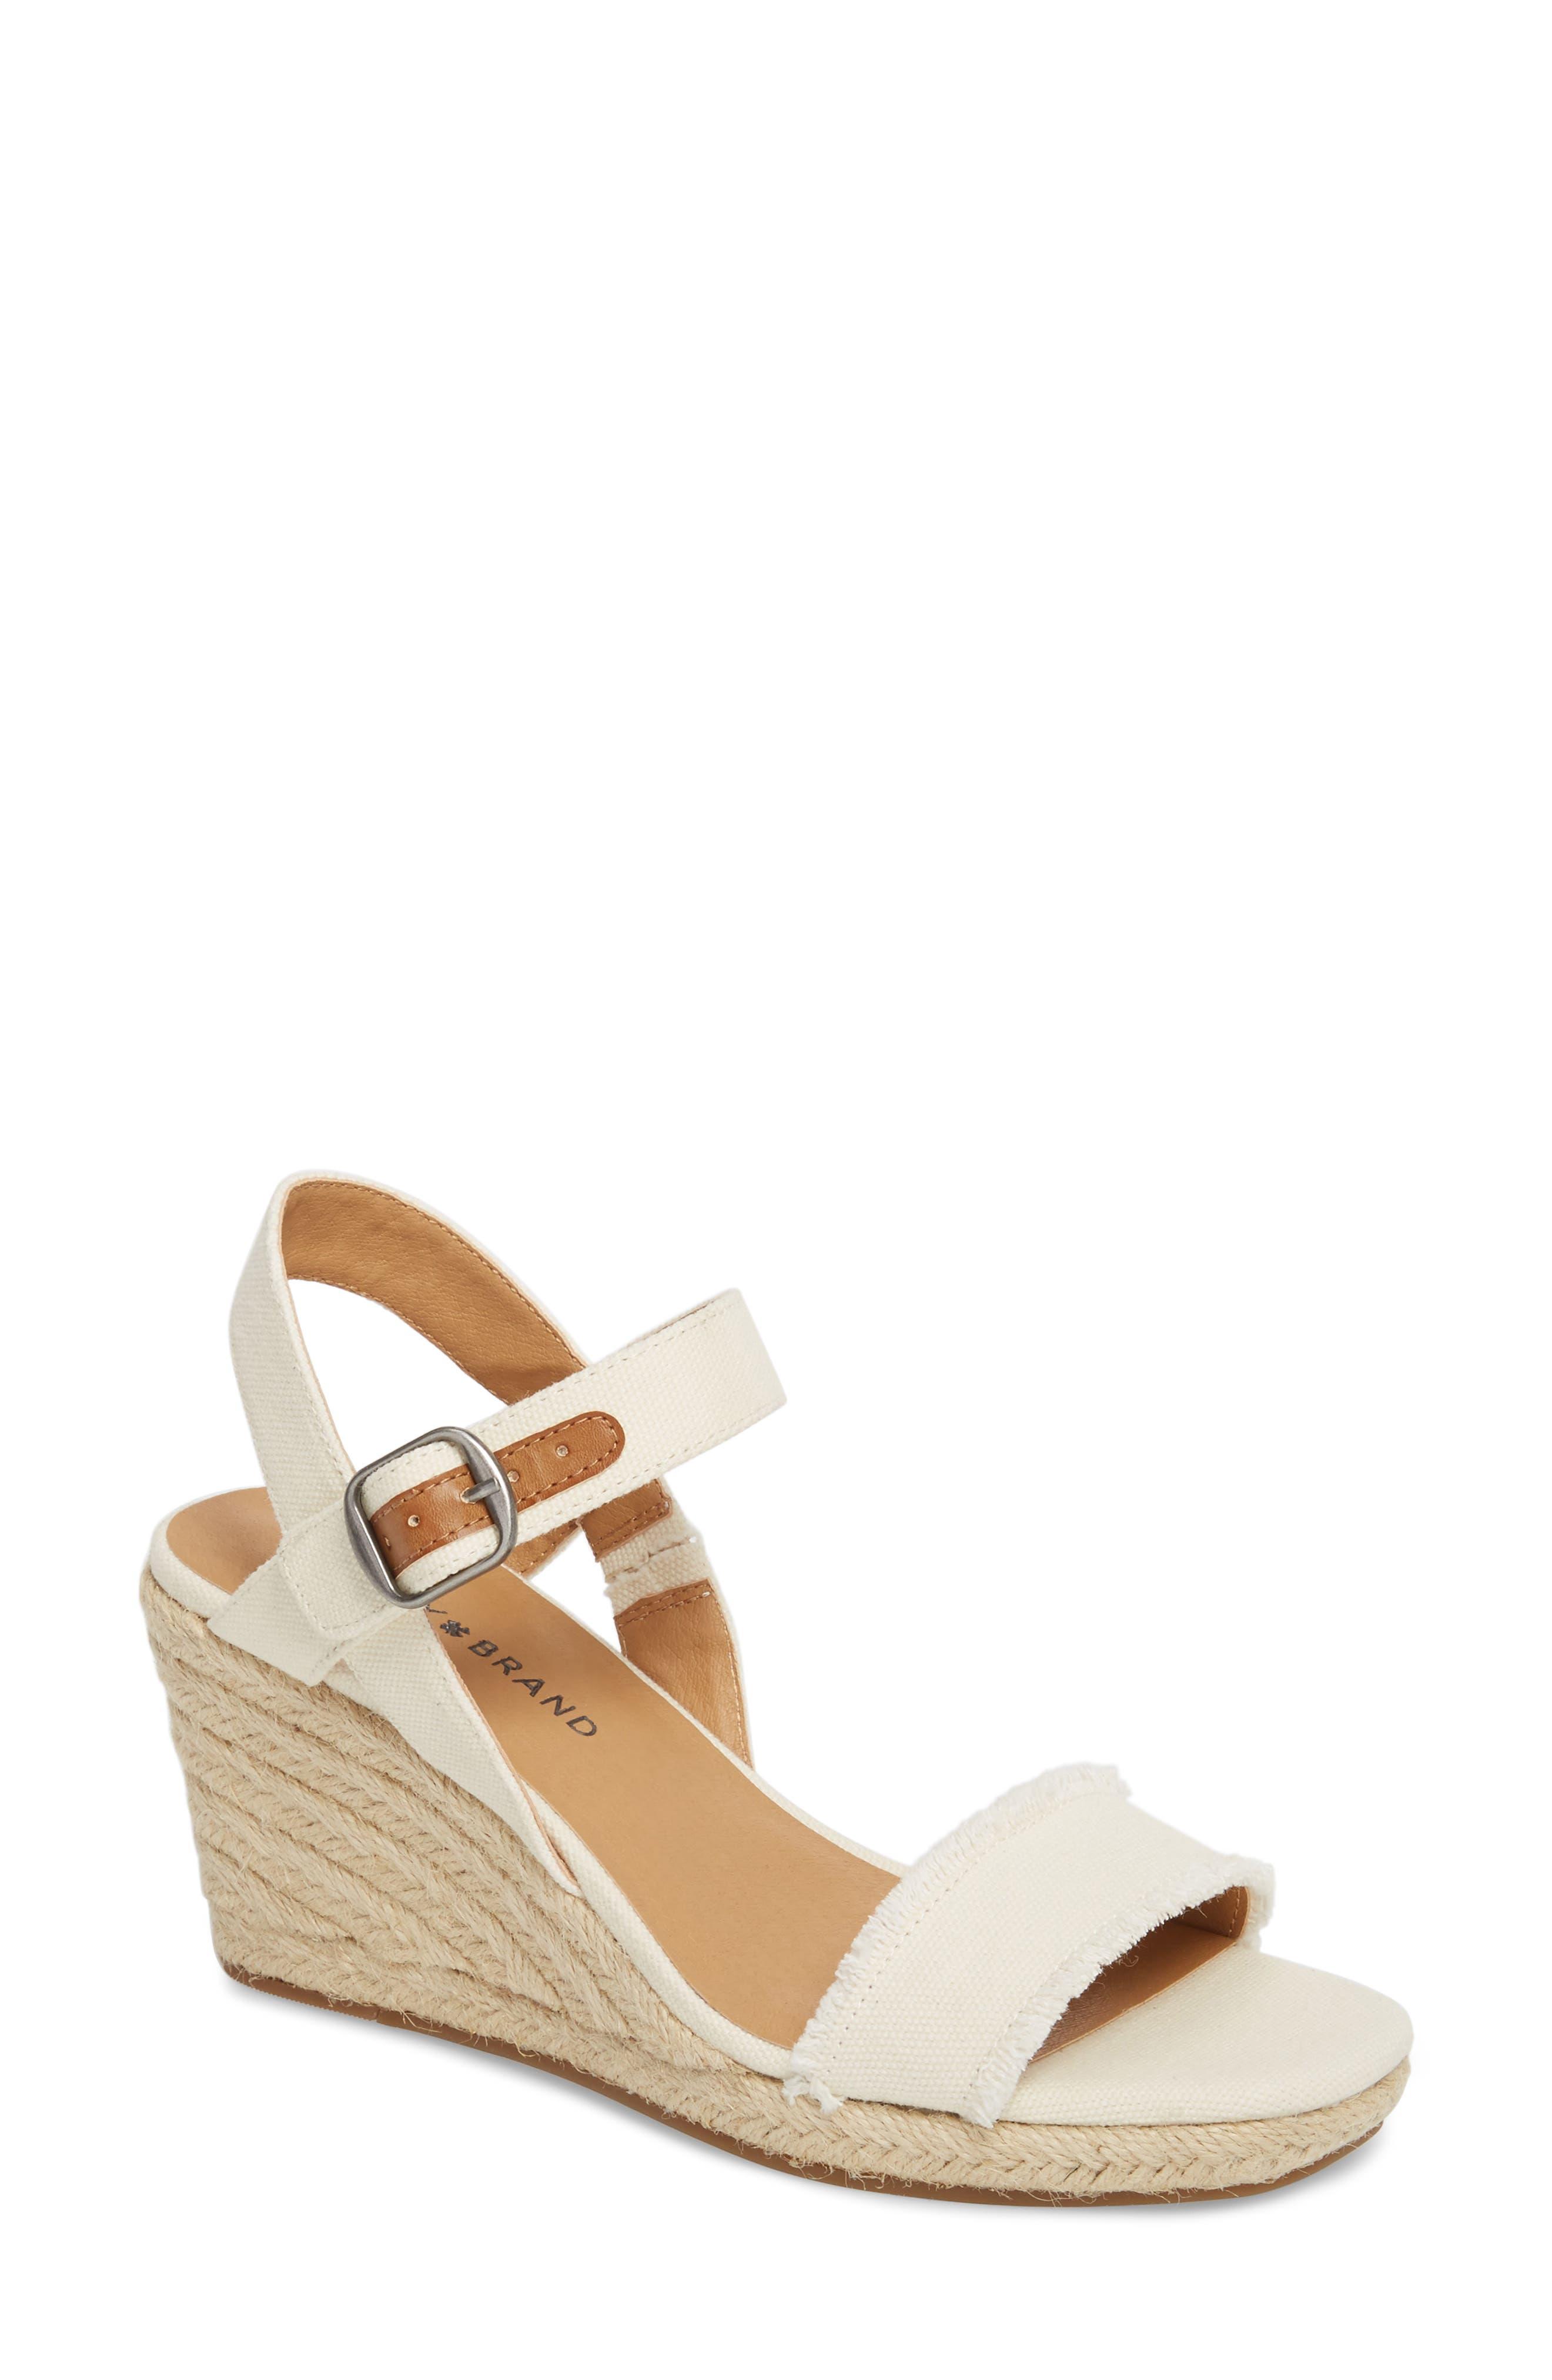 Marceline Squared Toe Wedge Sandal,                             Main thumbnail 2, color,